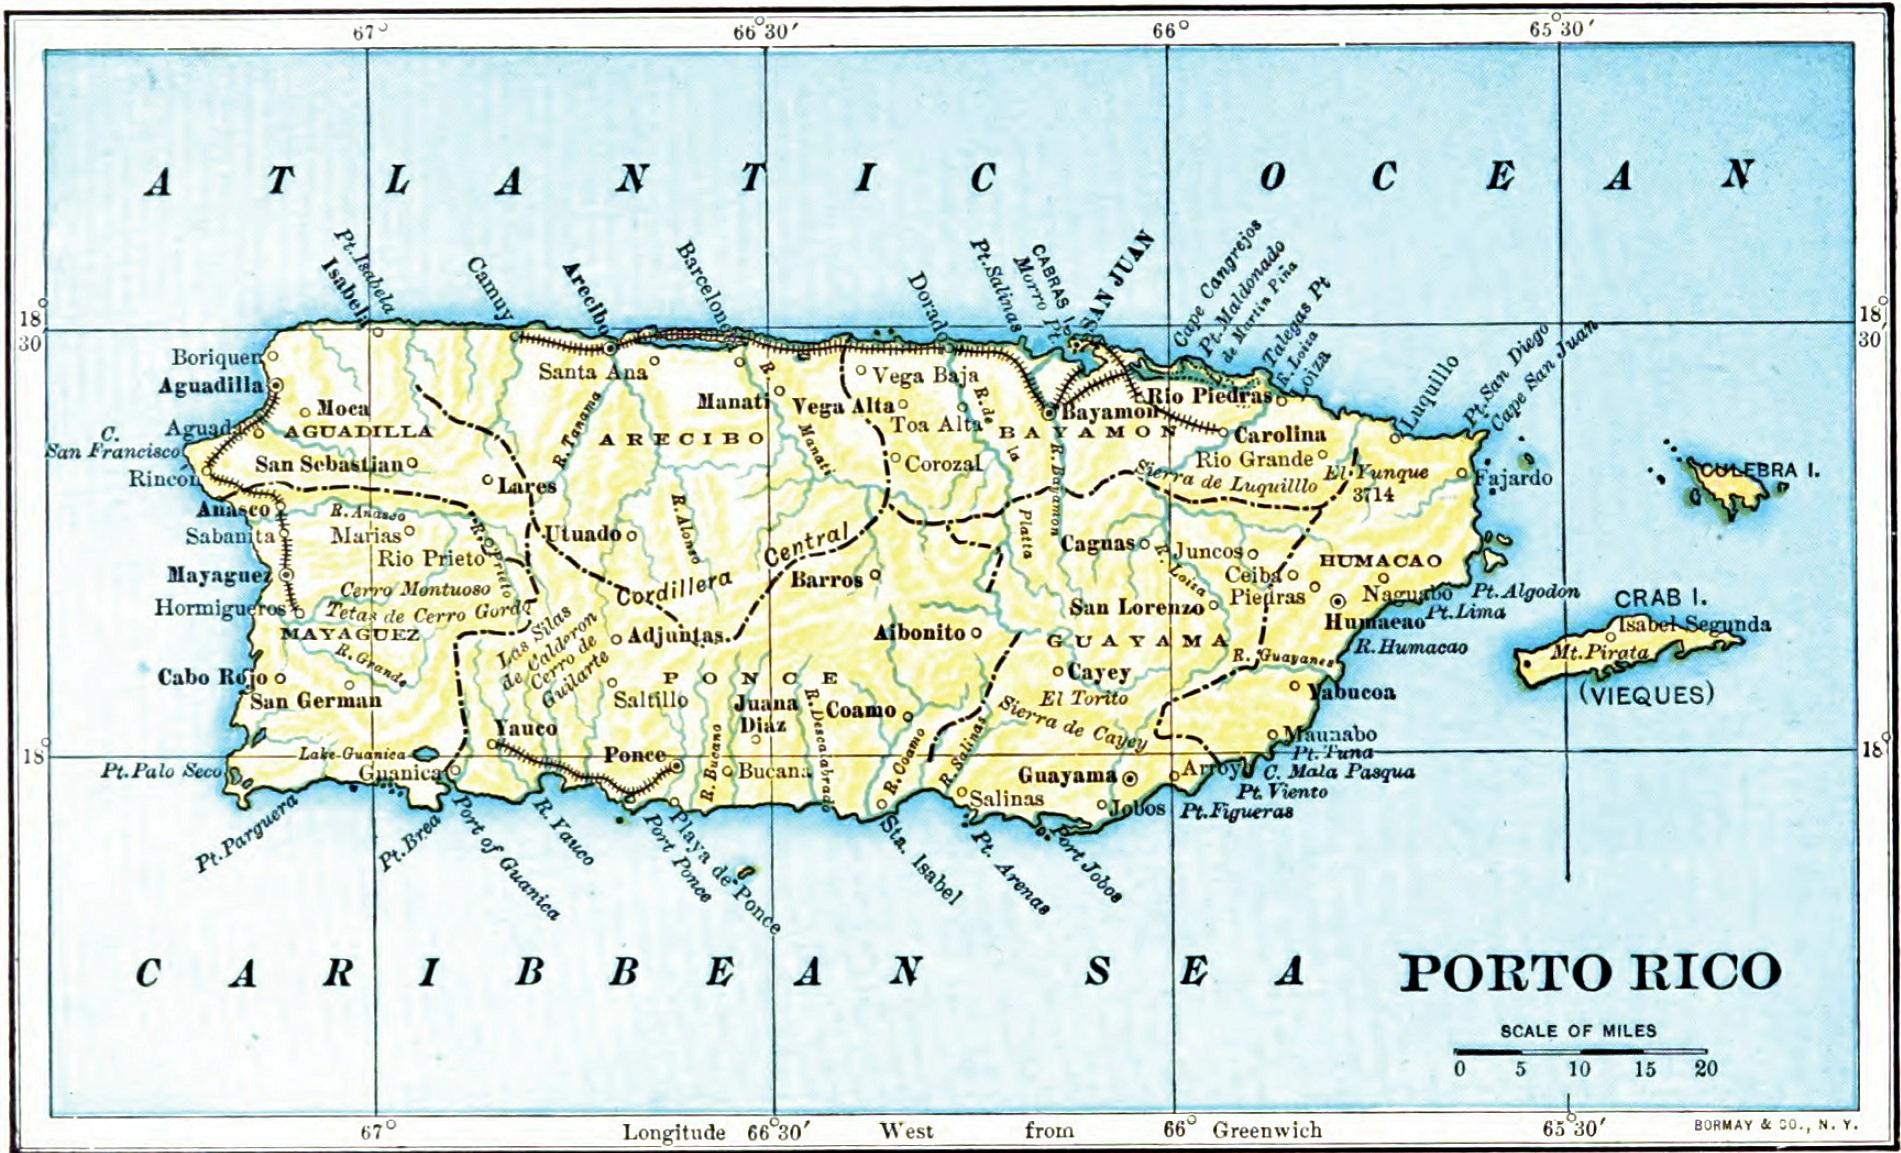 porto rico mapa File:1903 map of Porto Rico (Puerto Rico).   Wikimedia Commons porto rico mapa